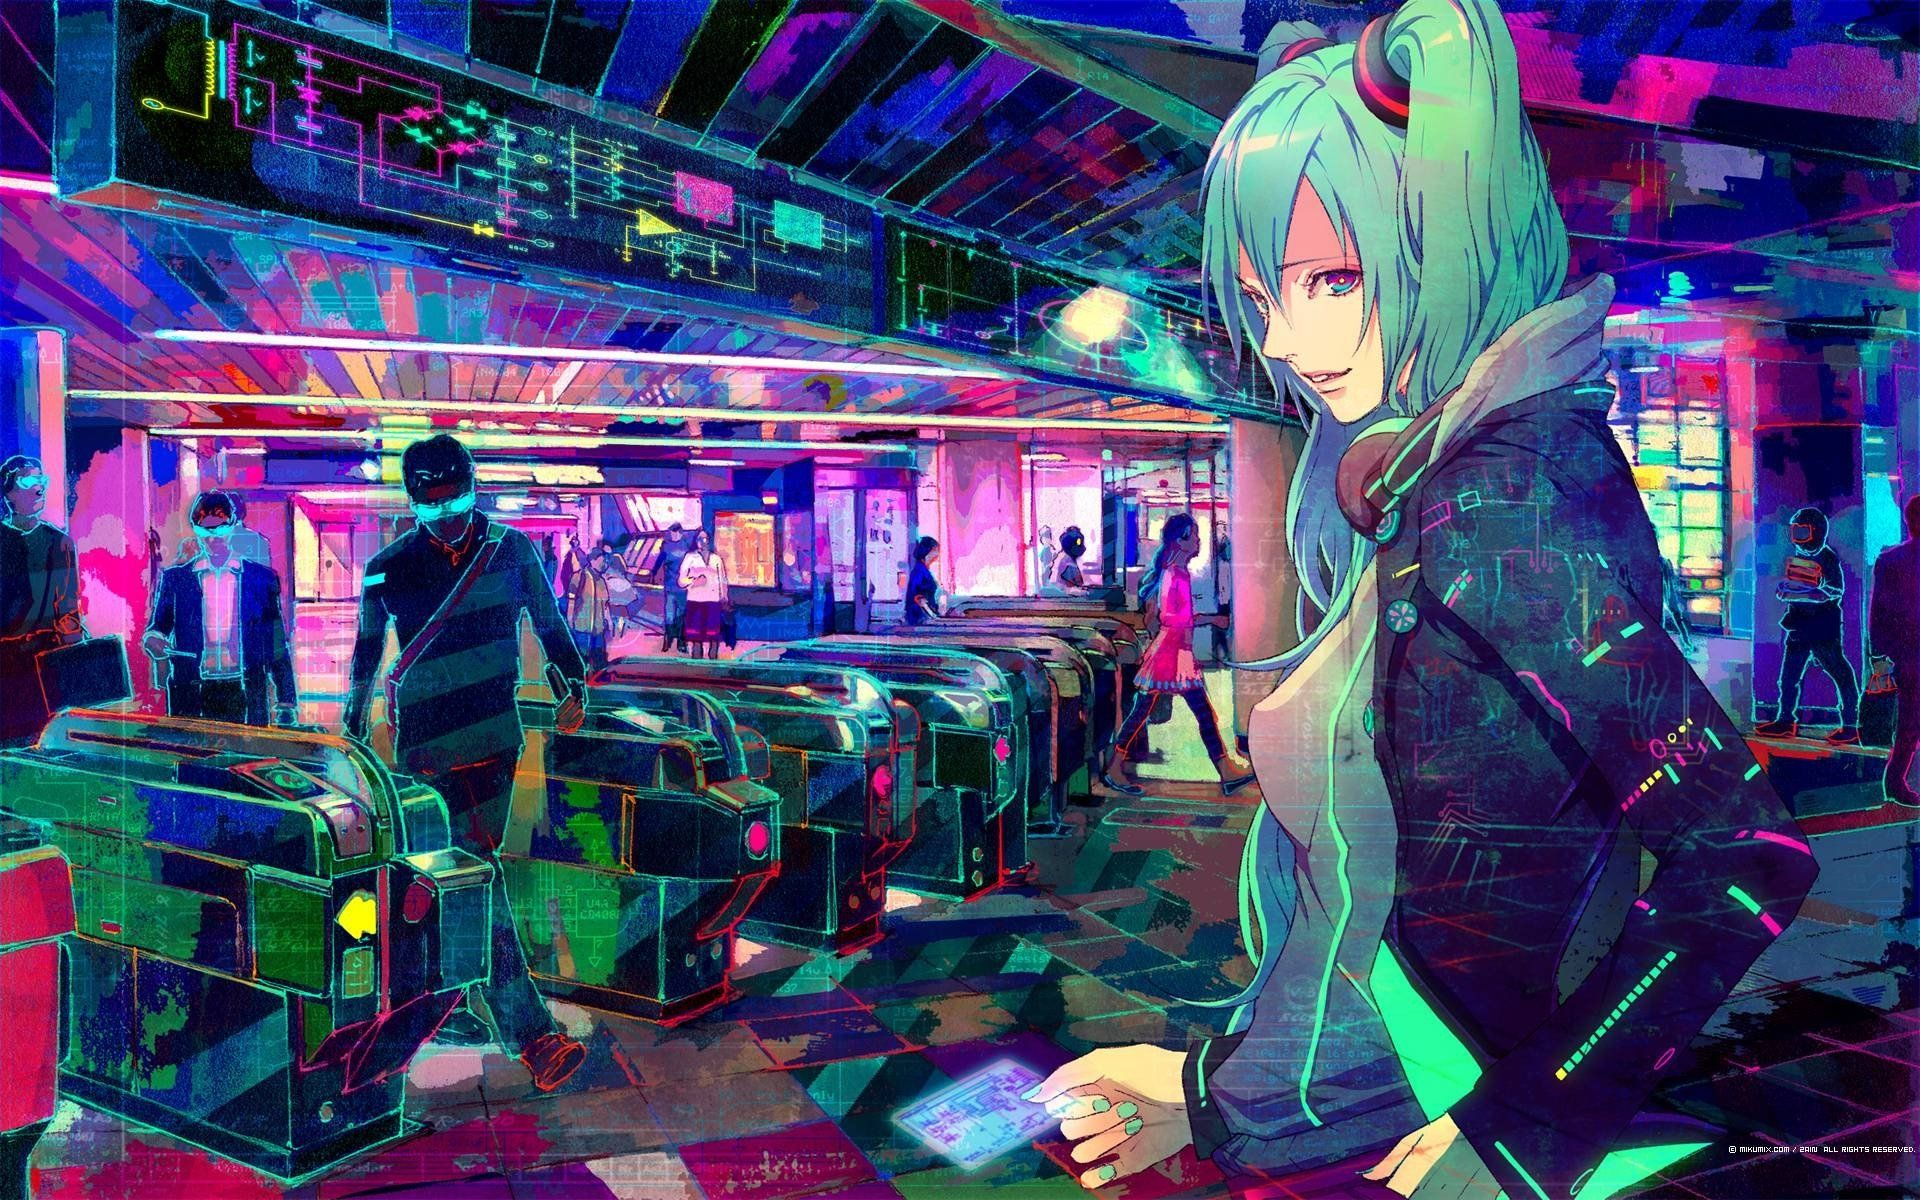 Cyberpunk Anime Headphones Hatsune Miku Vocaloid Train Stations